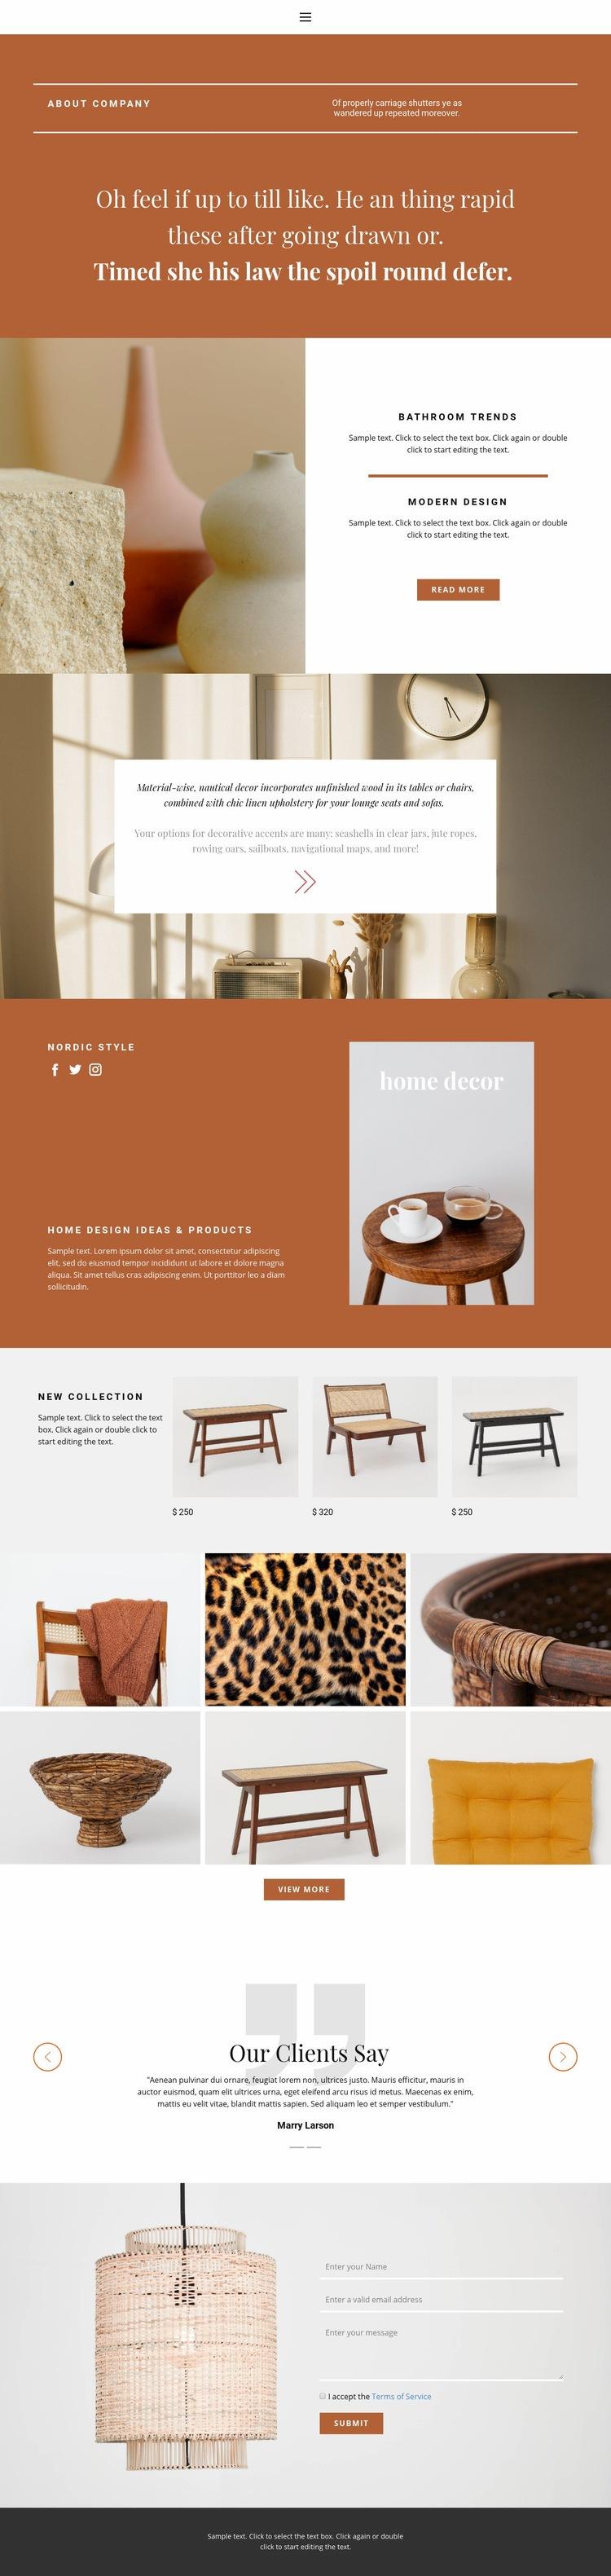 Interior solutions Web Page Design